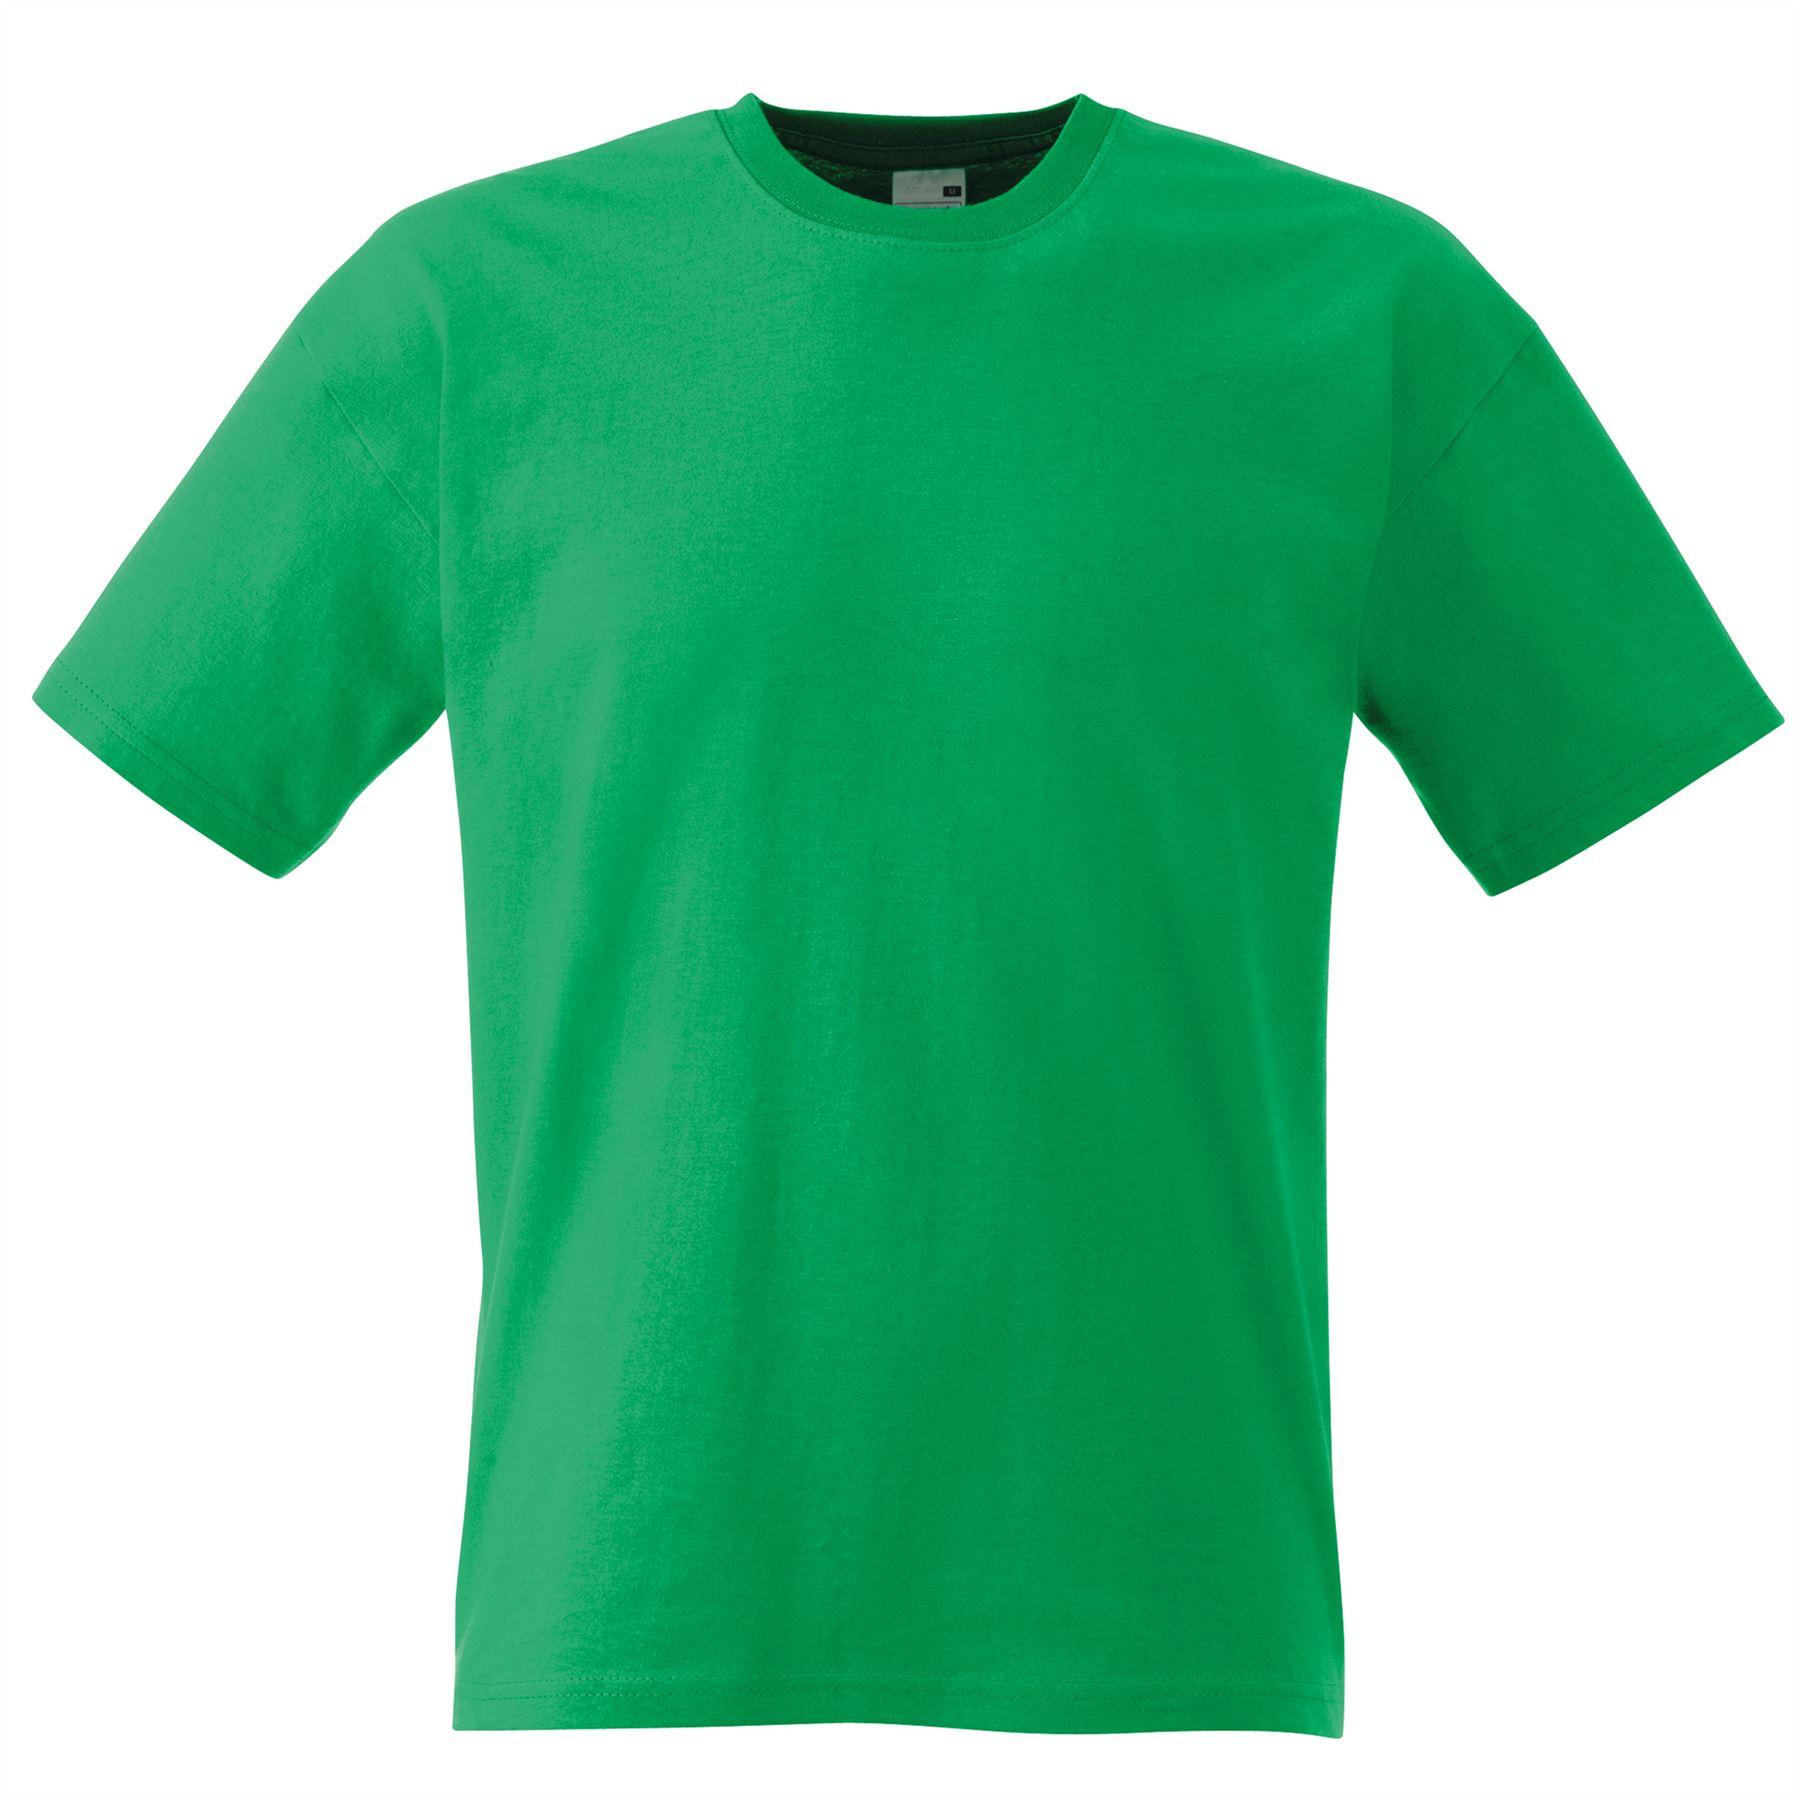 Fruit-of-the-loom-fotl-original-tee-t-shirt-uni-coton-top-screen-stars